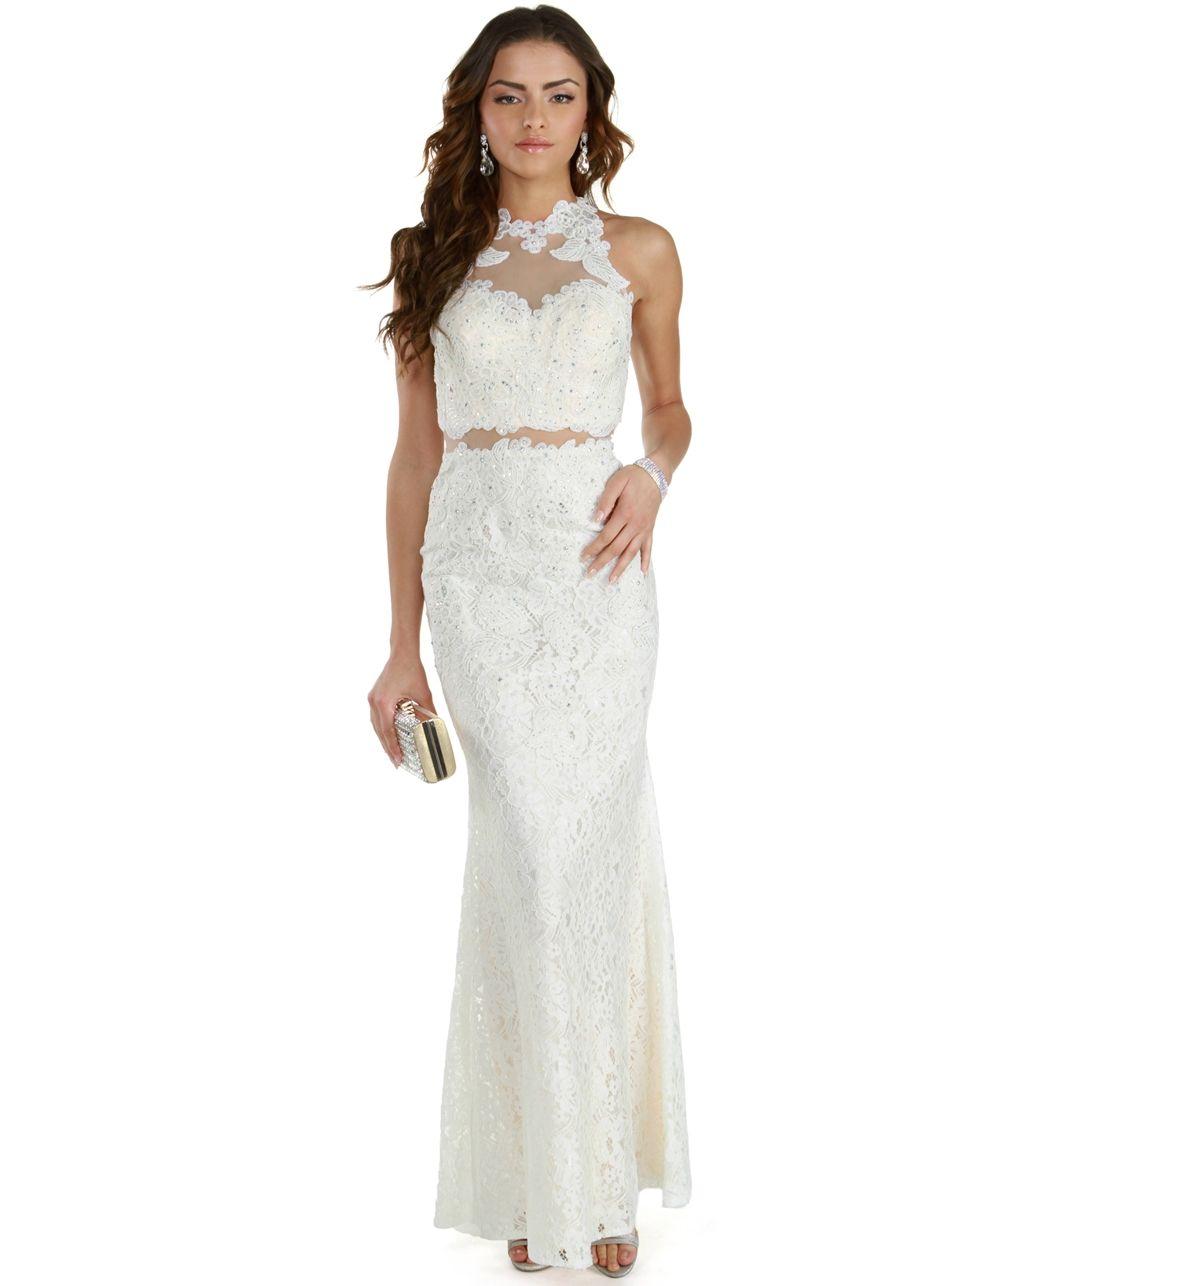 Promo Caroline Ivory Lace Prom Dress Lace Prom Dress High Neck Prom Dress Prom Dresses [ 1286 x 1180 Pixel ]